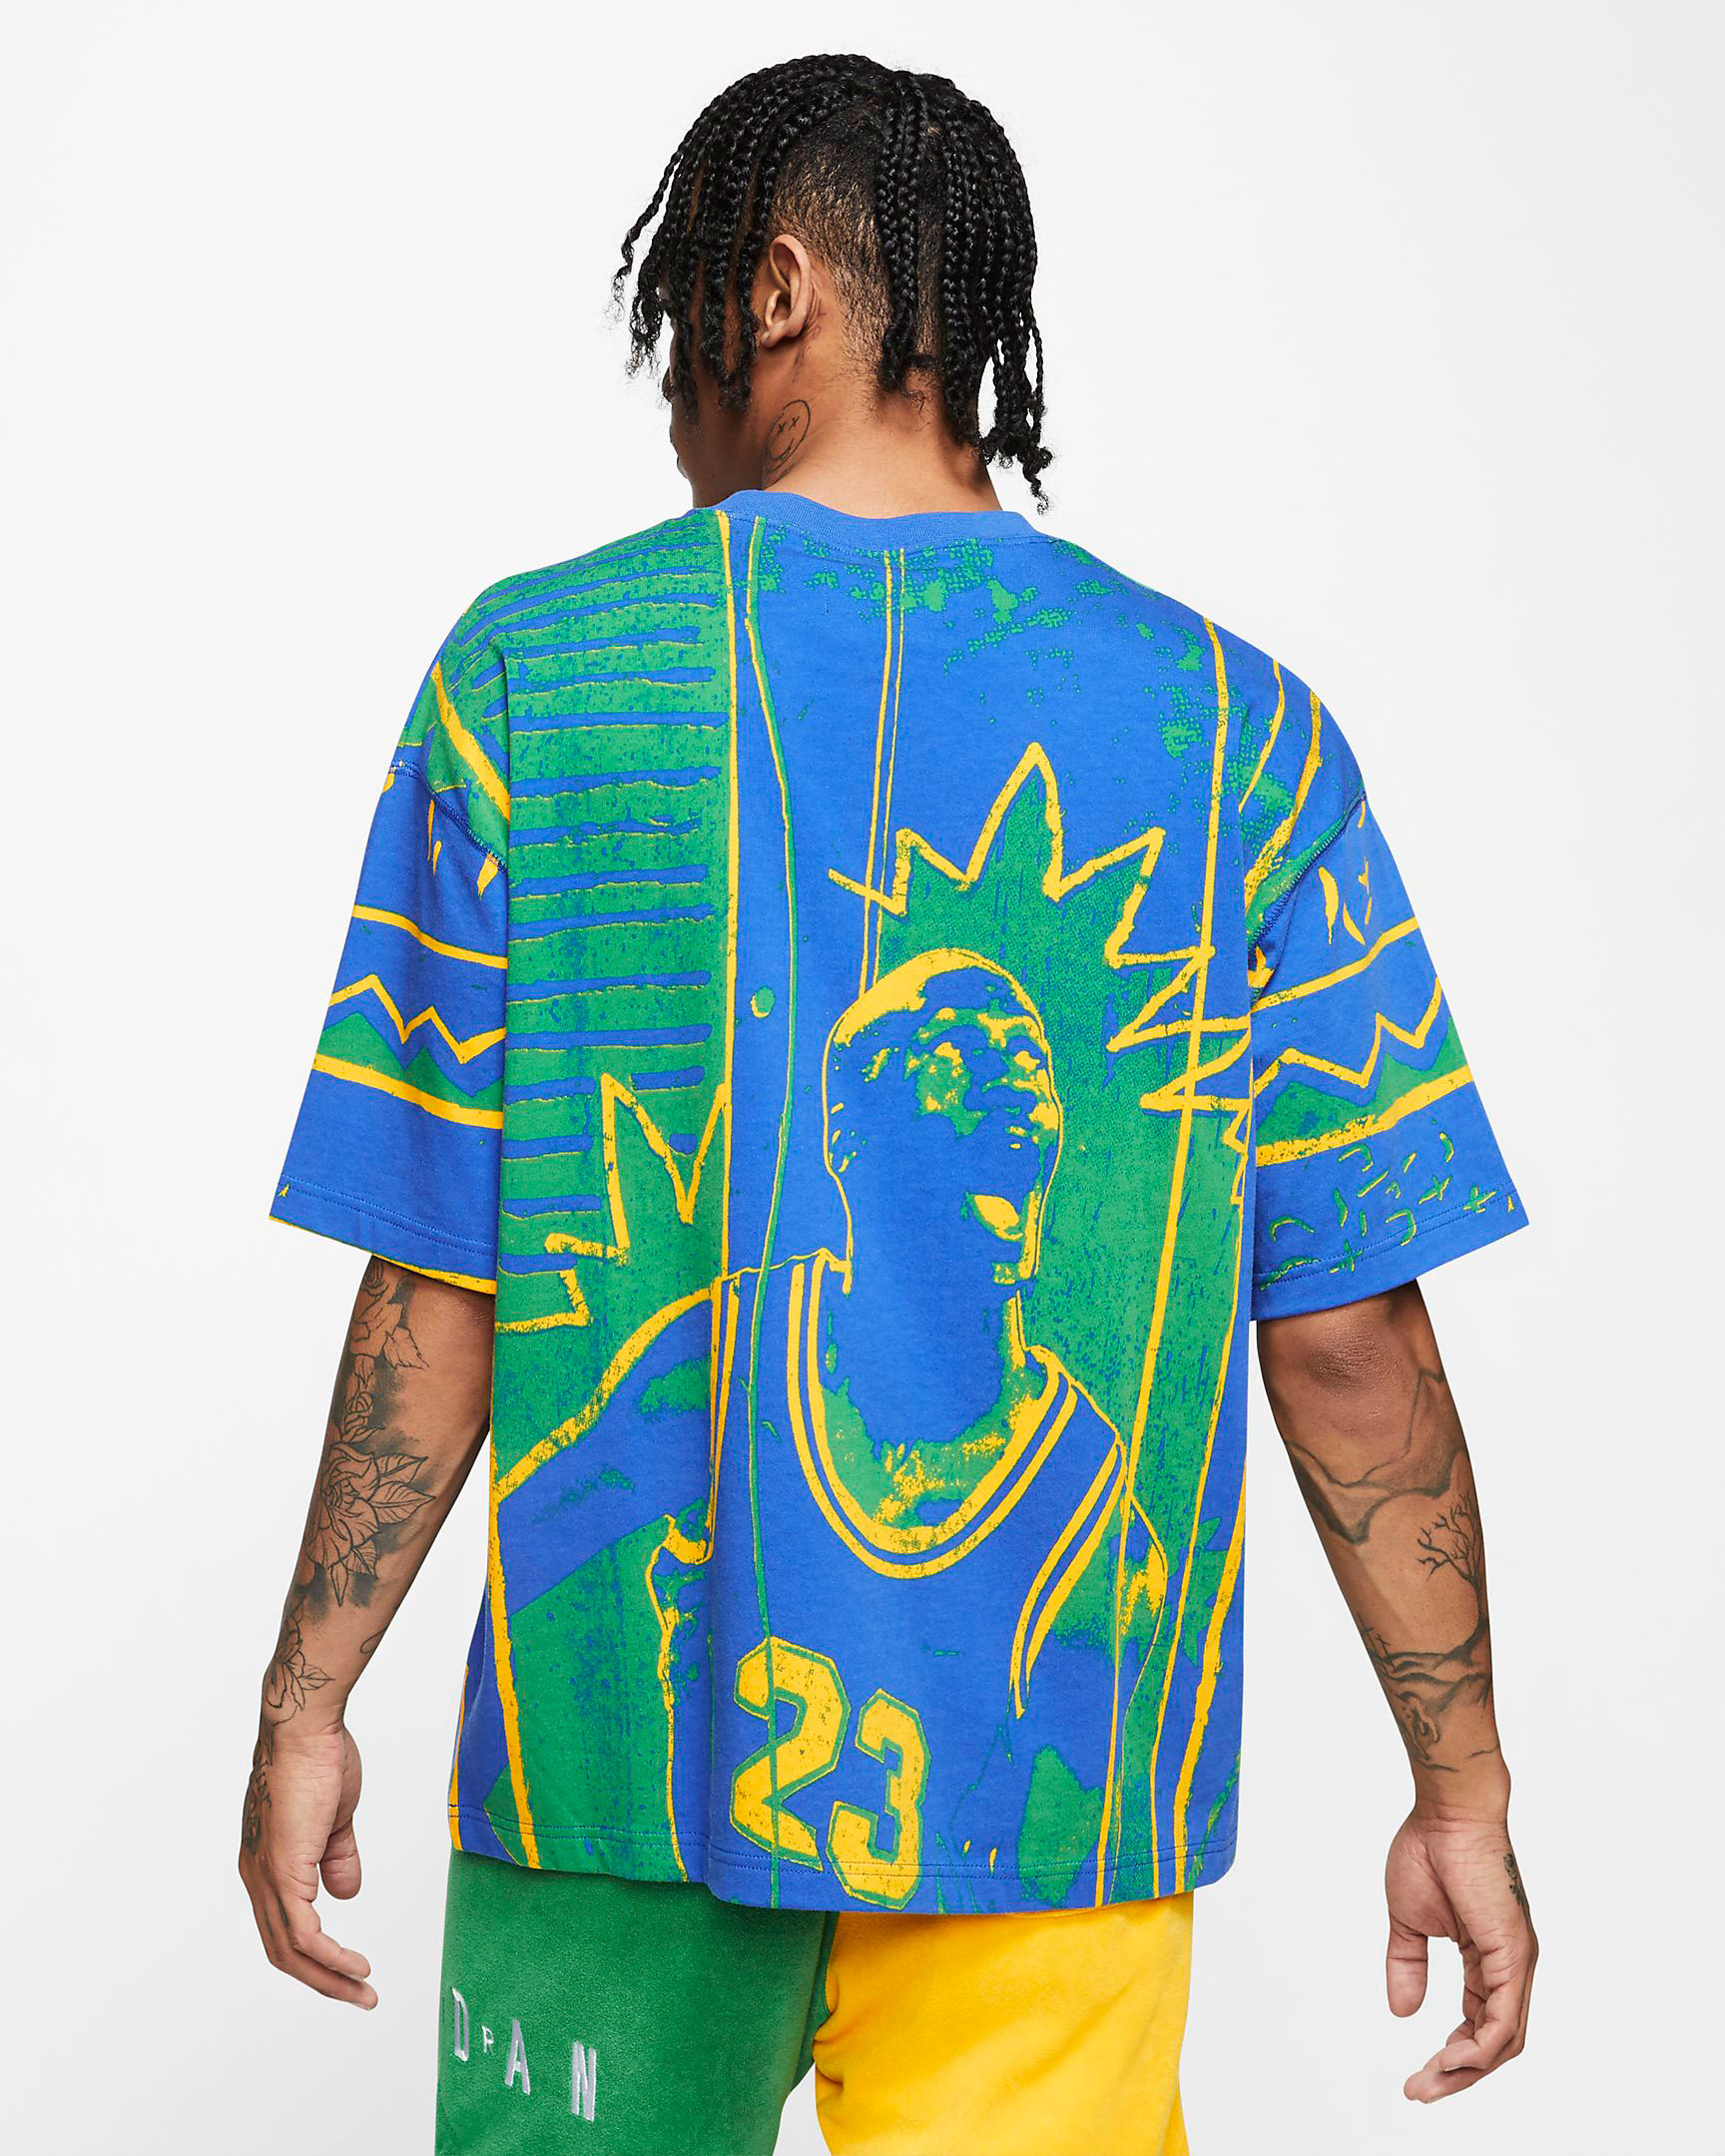 nike-dunk-low-brazil-shirt-match-1